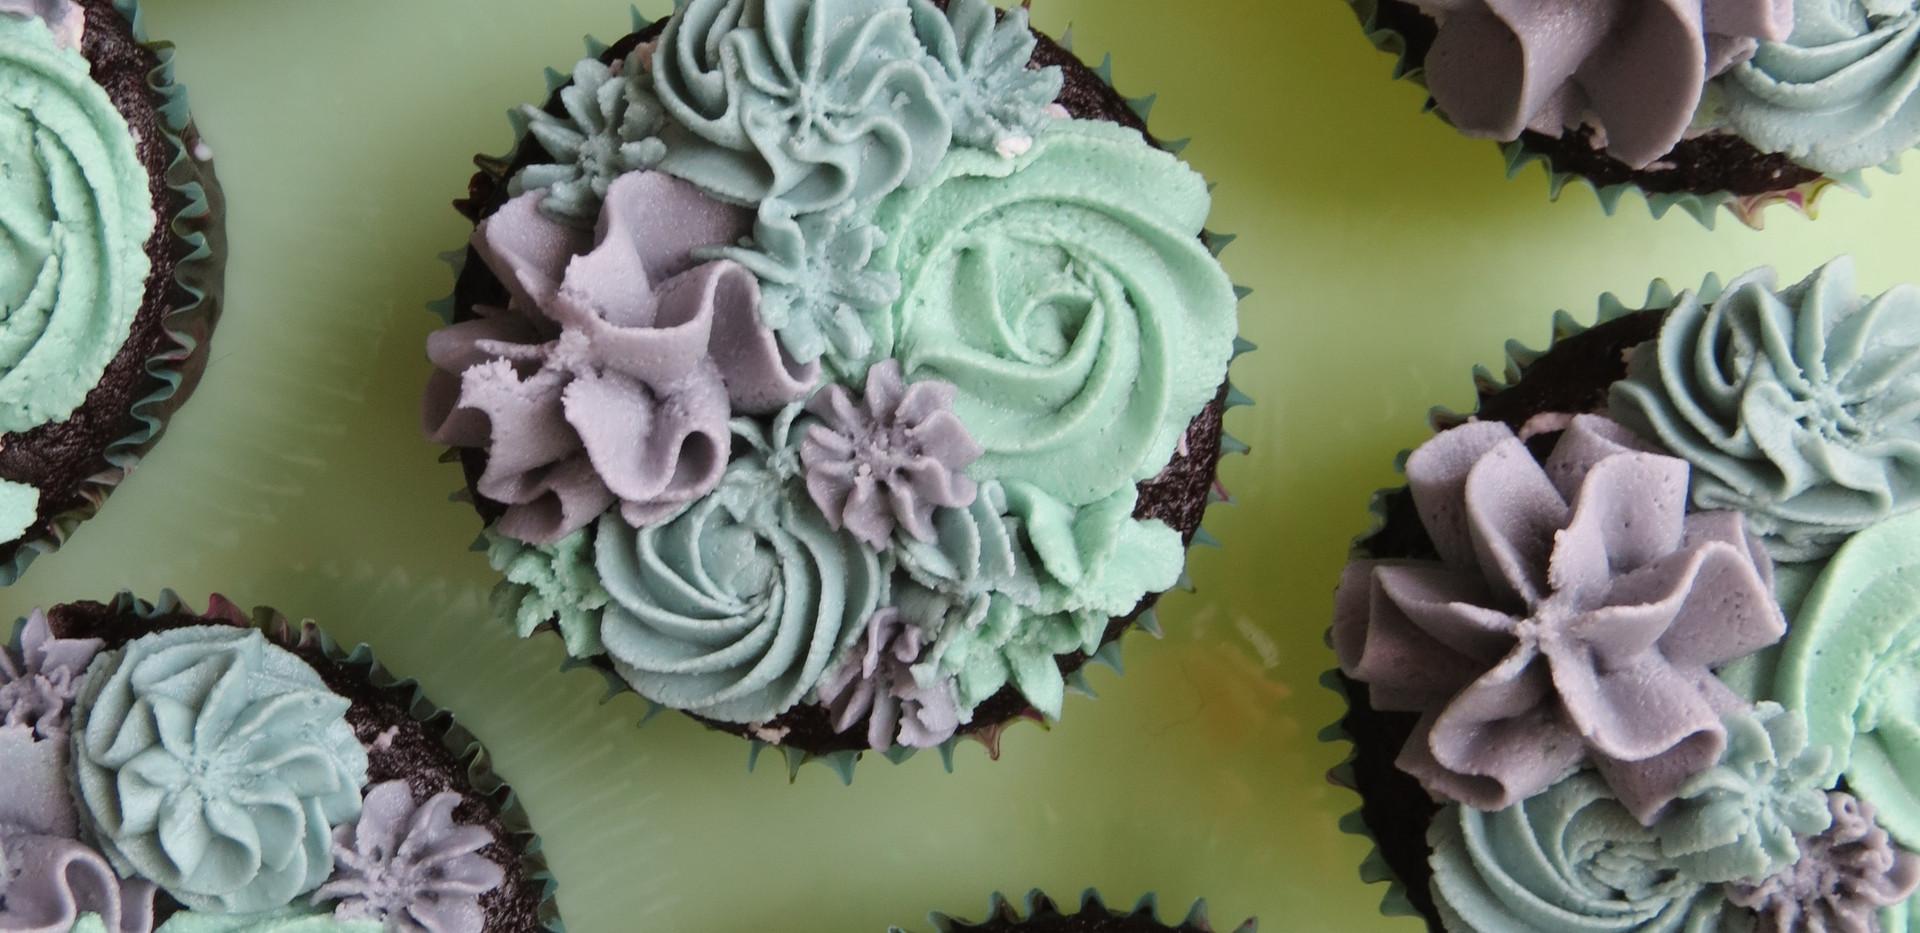 Chococlate Cabernet Cupcakes